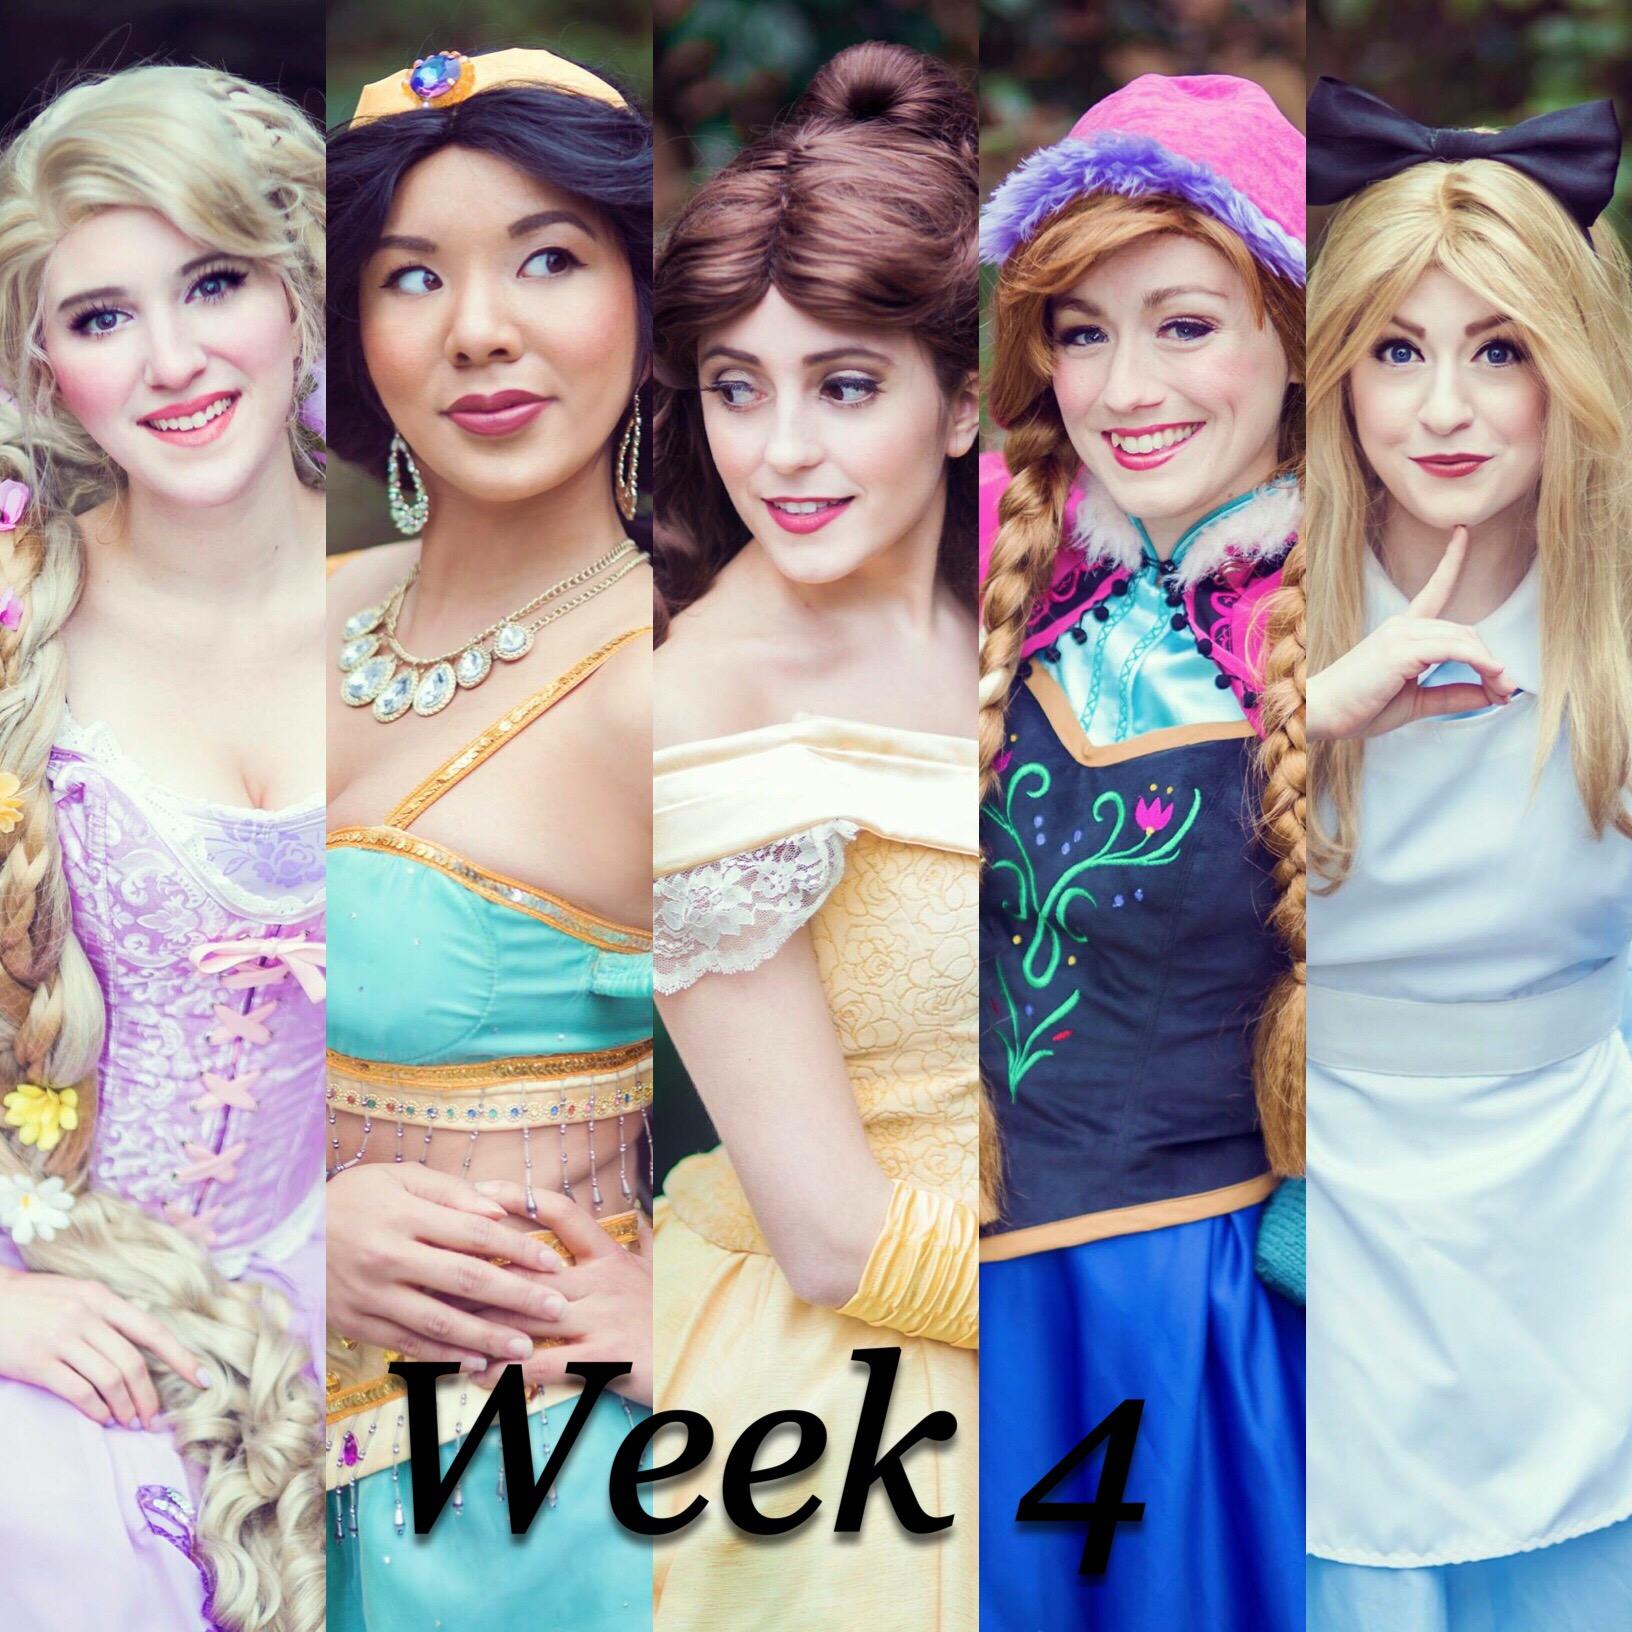 Week 4 Princess Camp